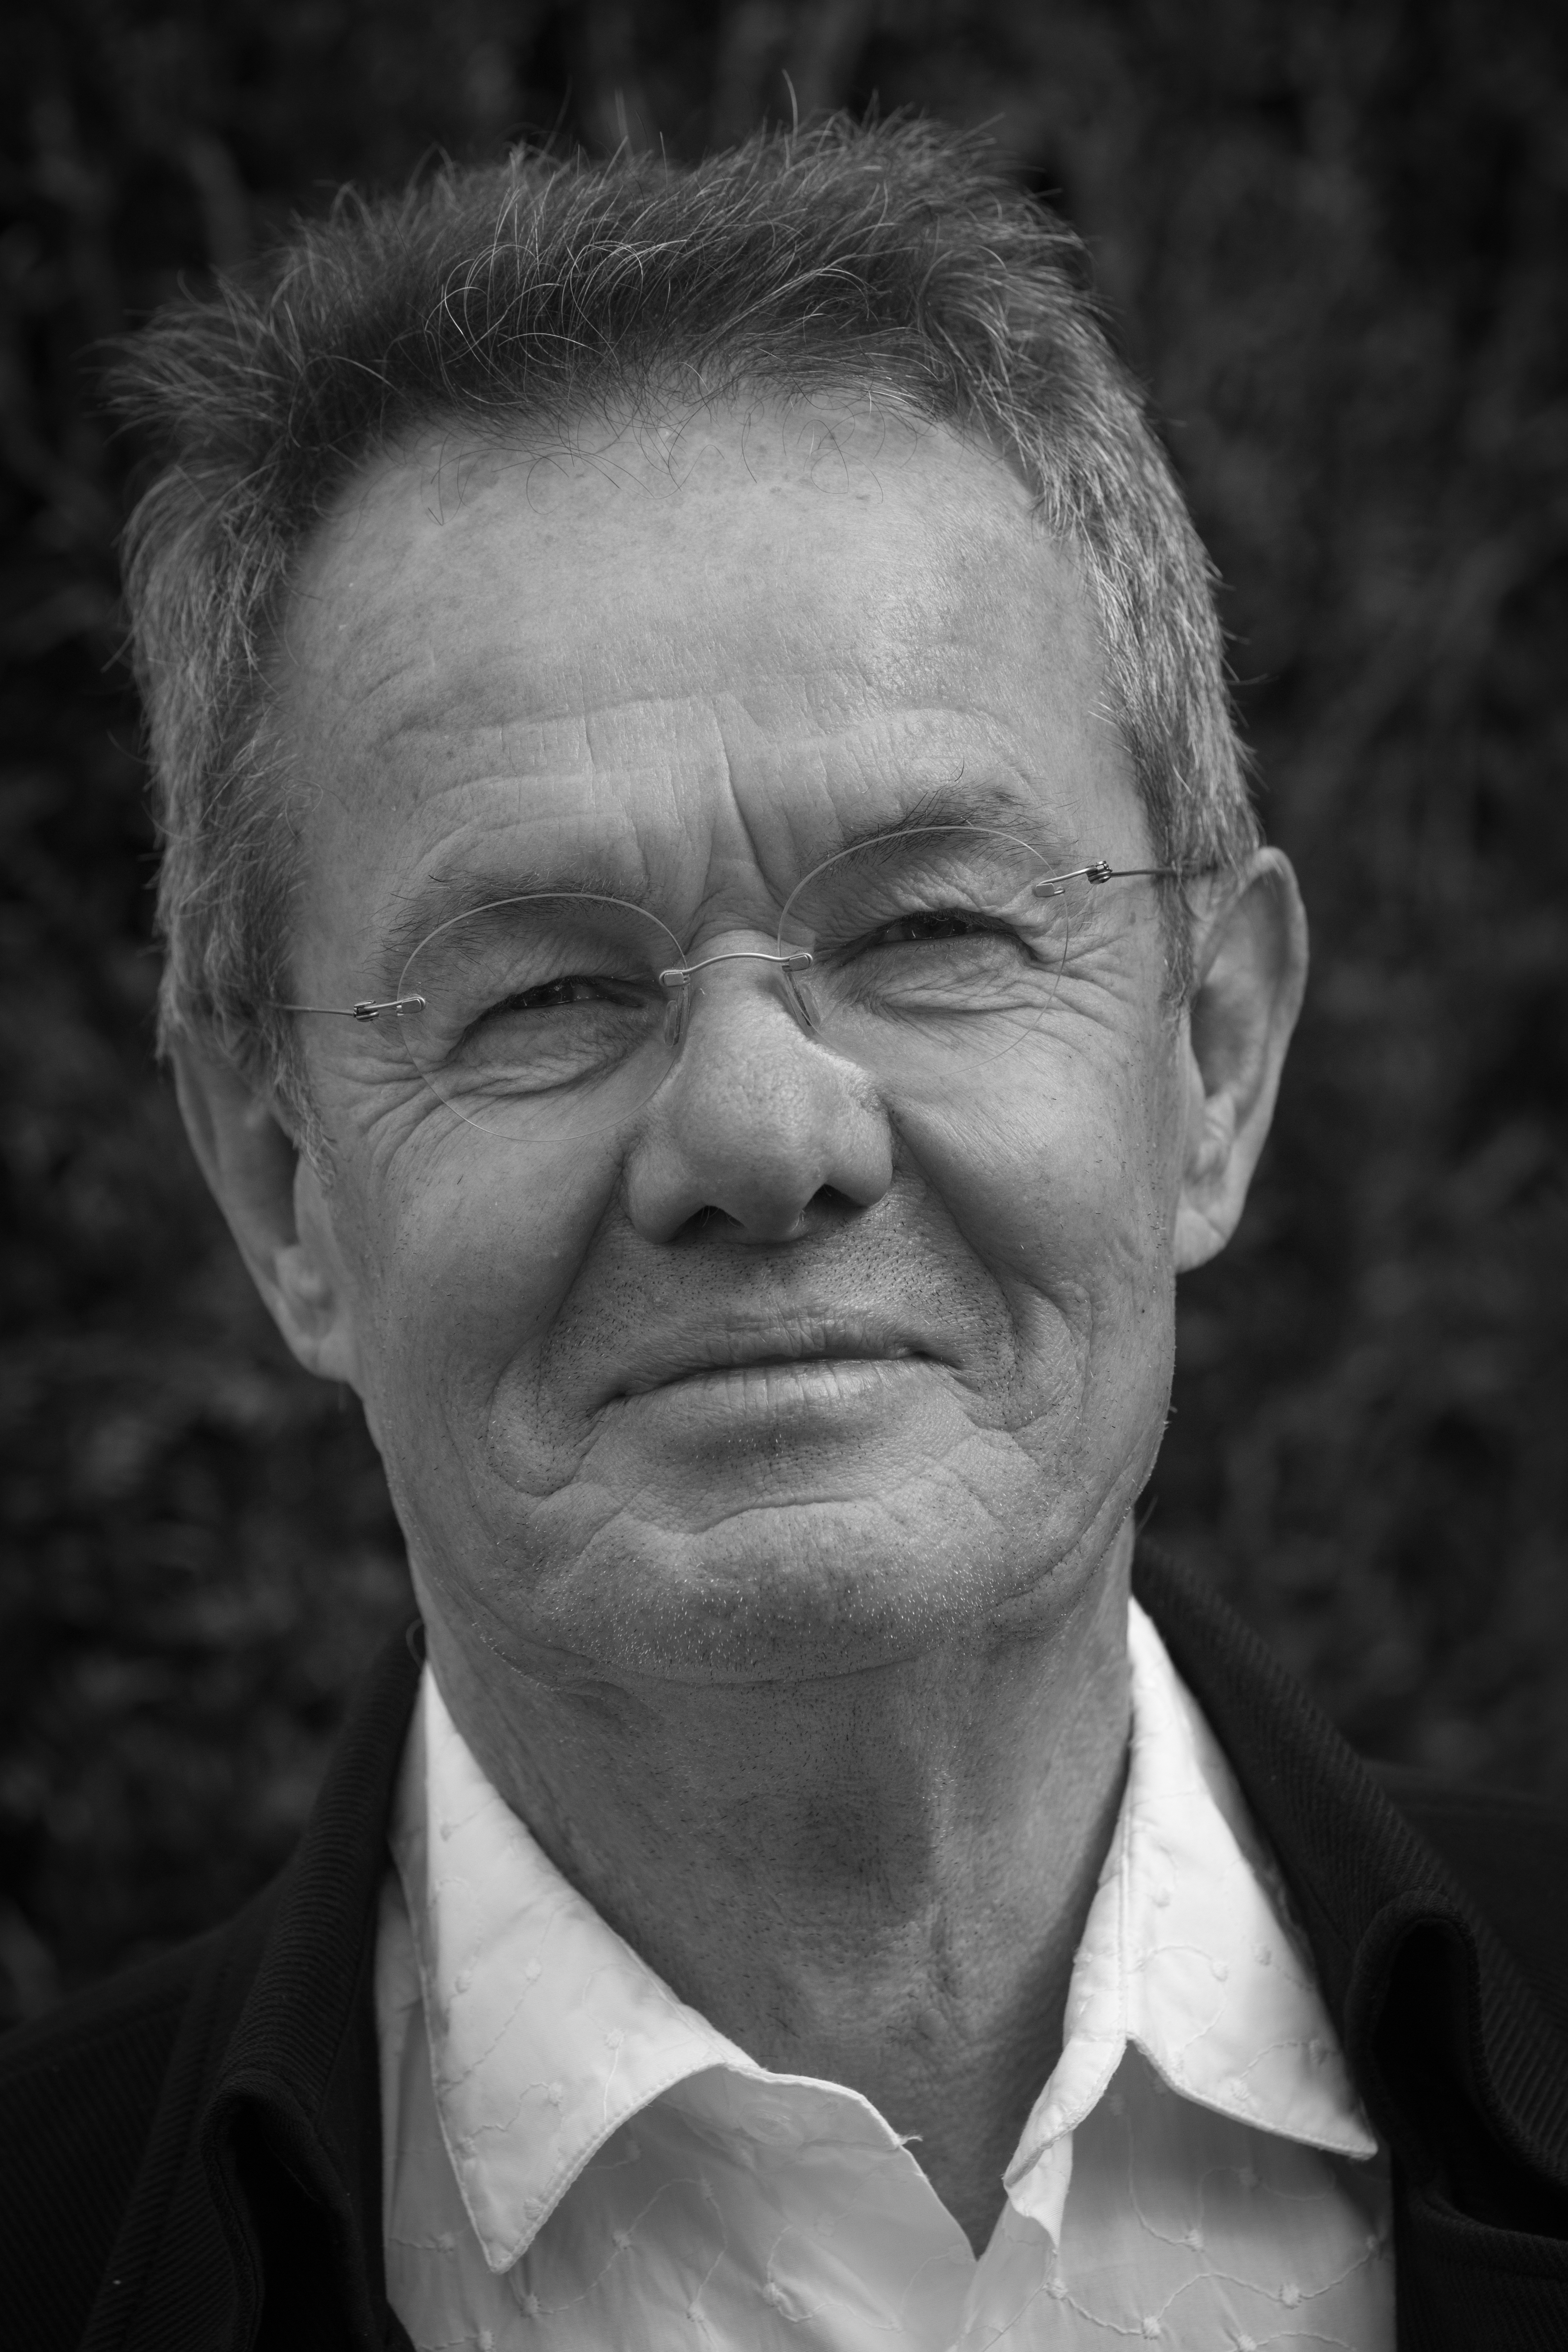 Jean-Paul Kauffmann in October 2013.